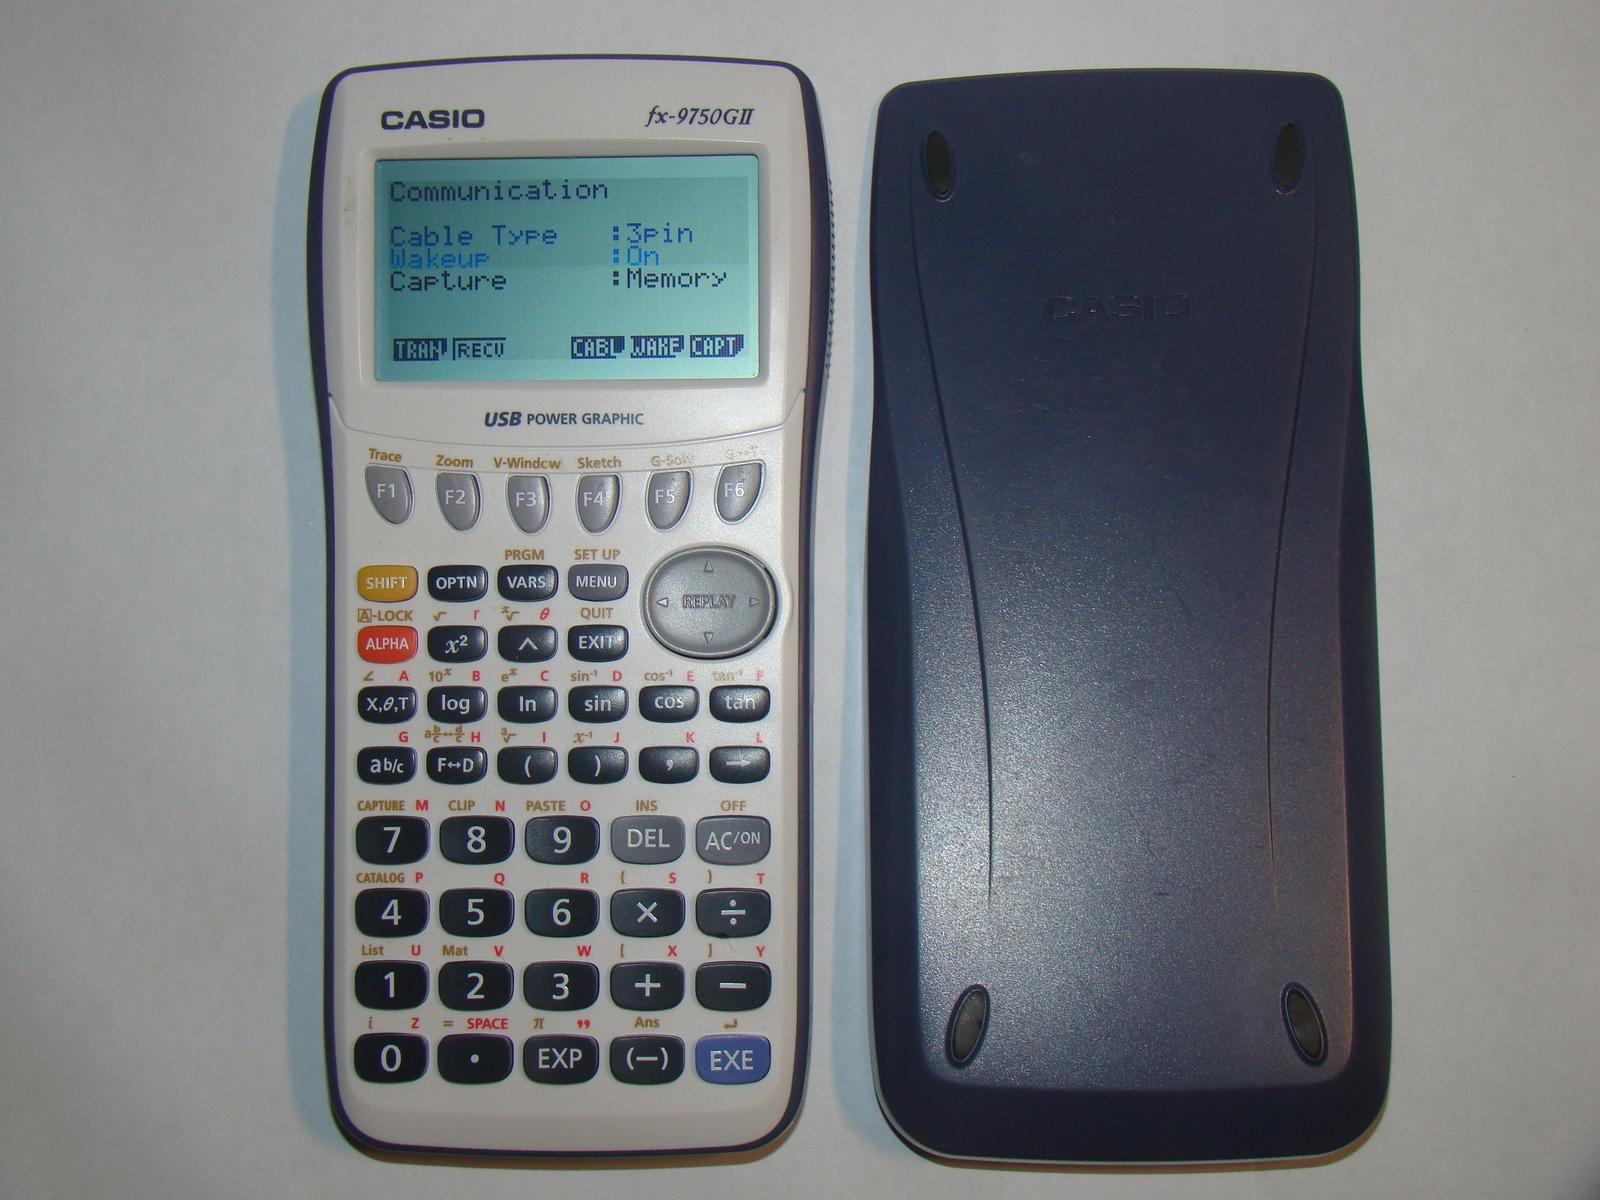 CASIO fx-9750GII - Graphing Calculator